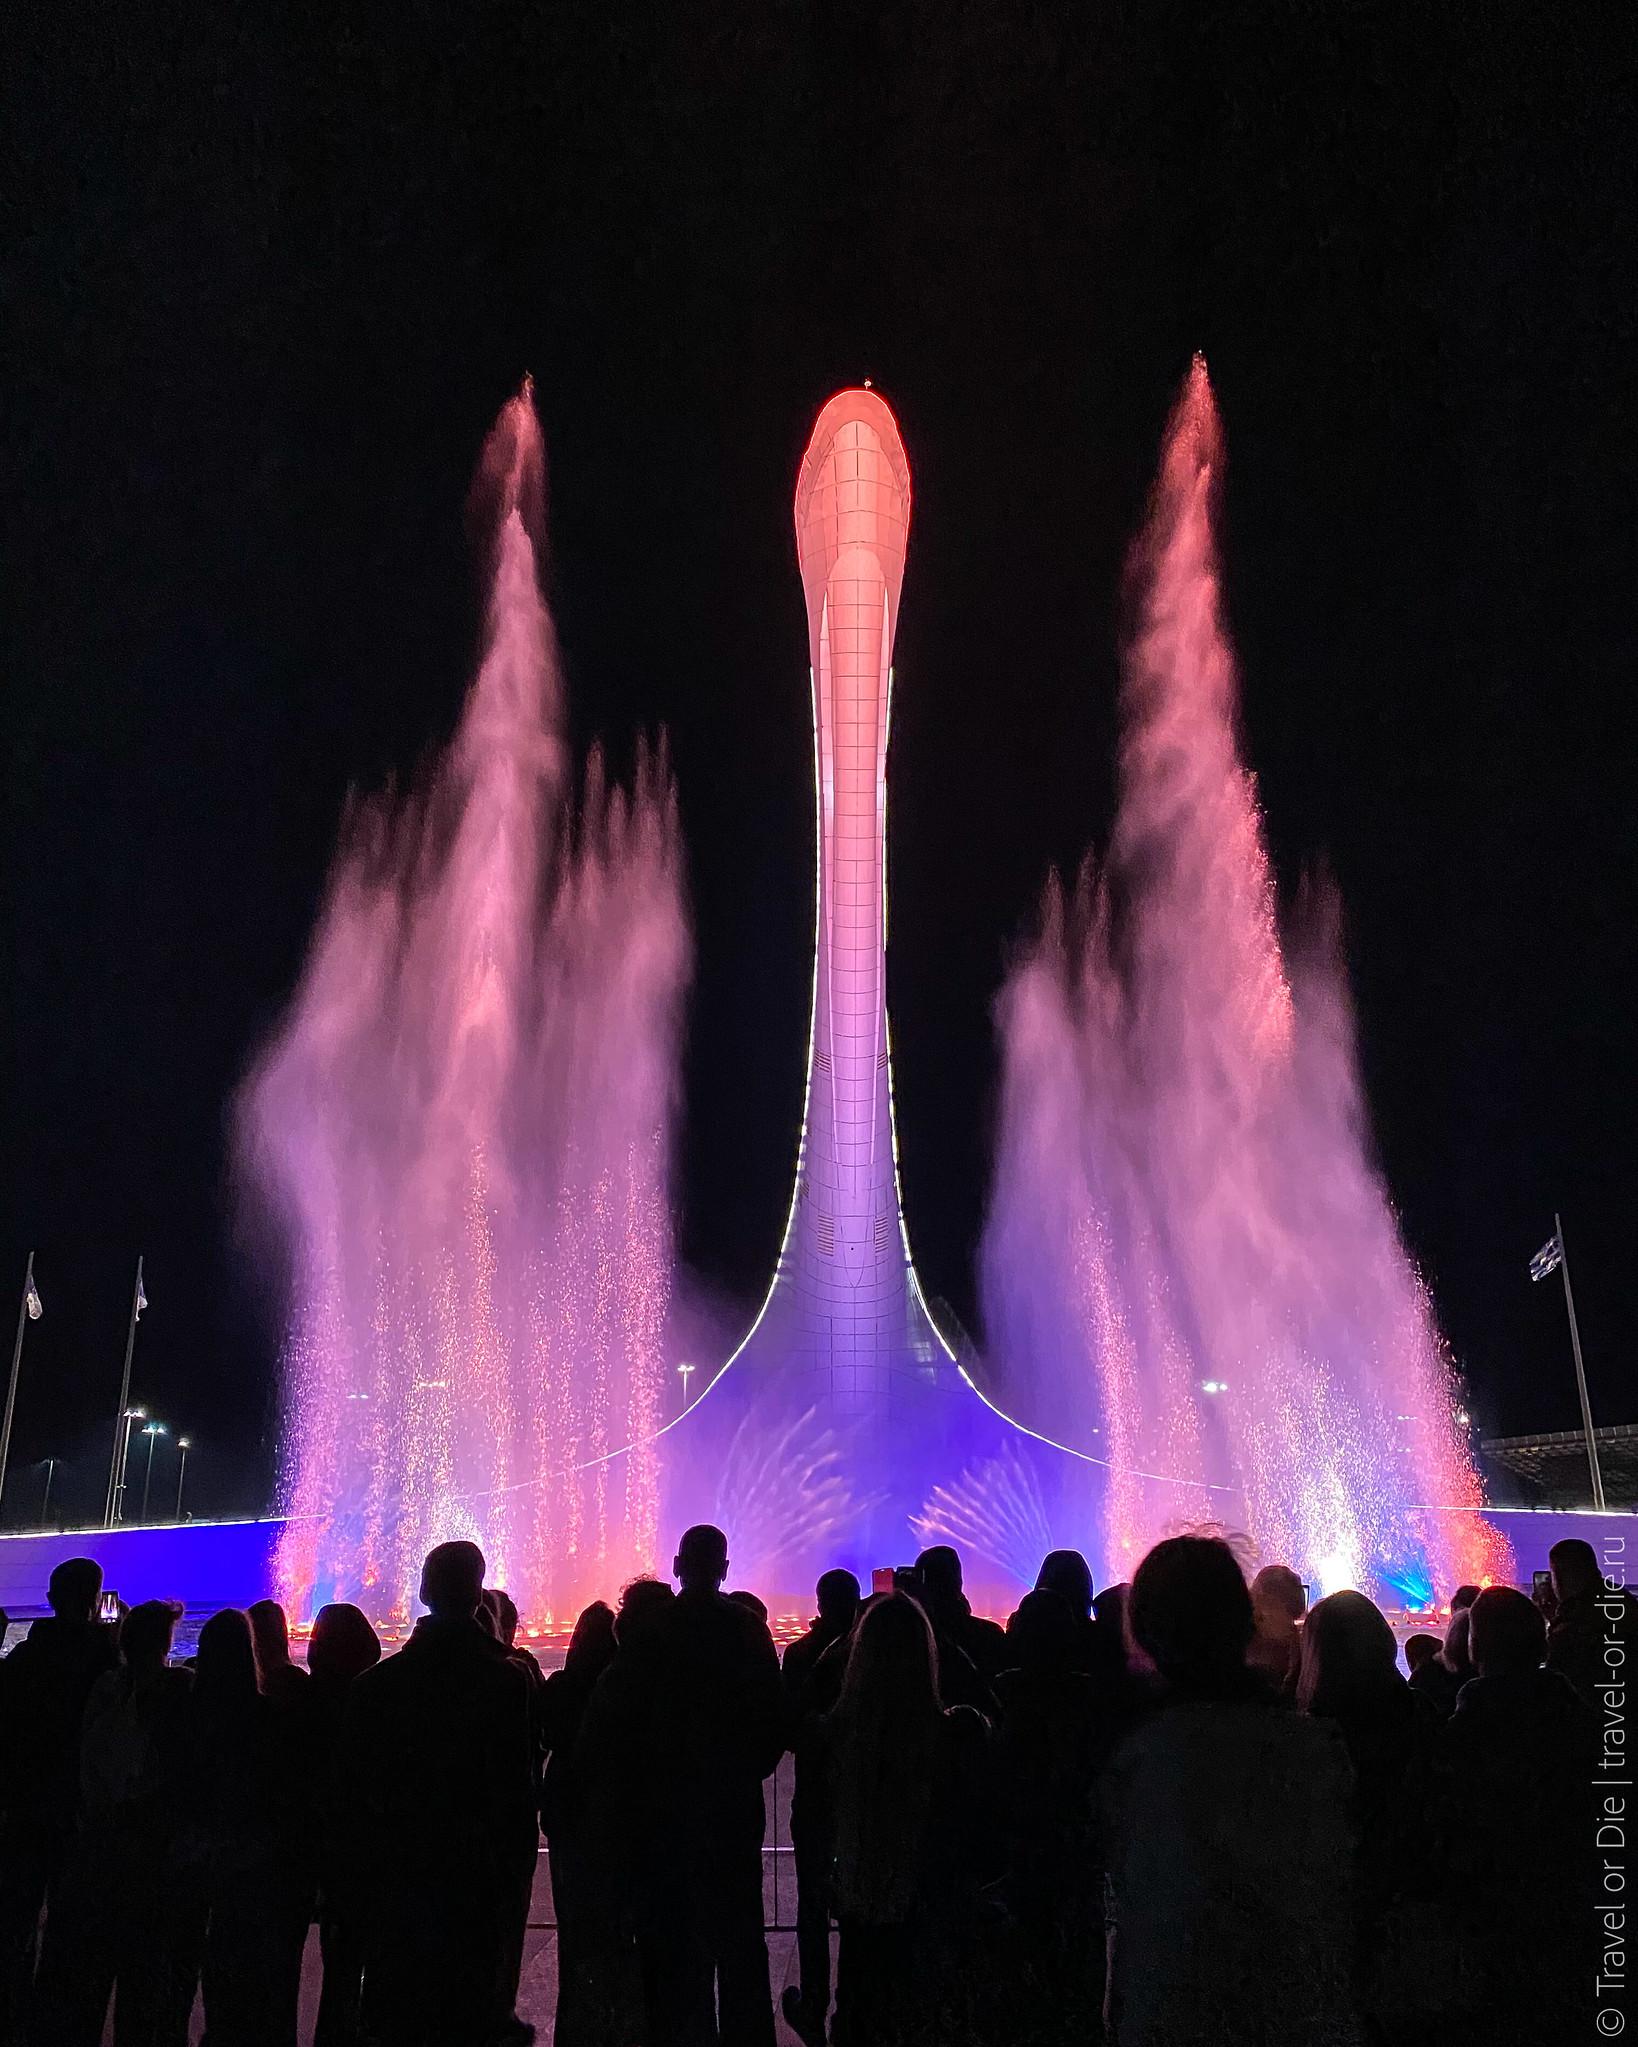 Singing-Fountain-Olympic-Park-Sochi-0940